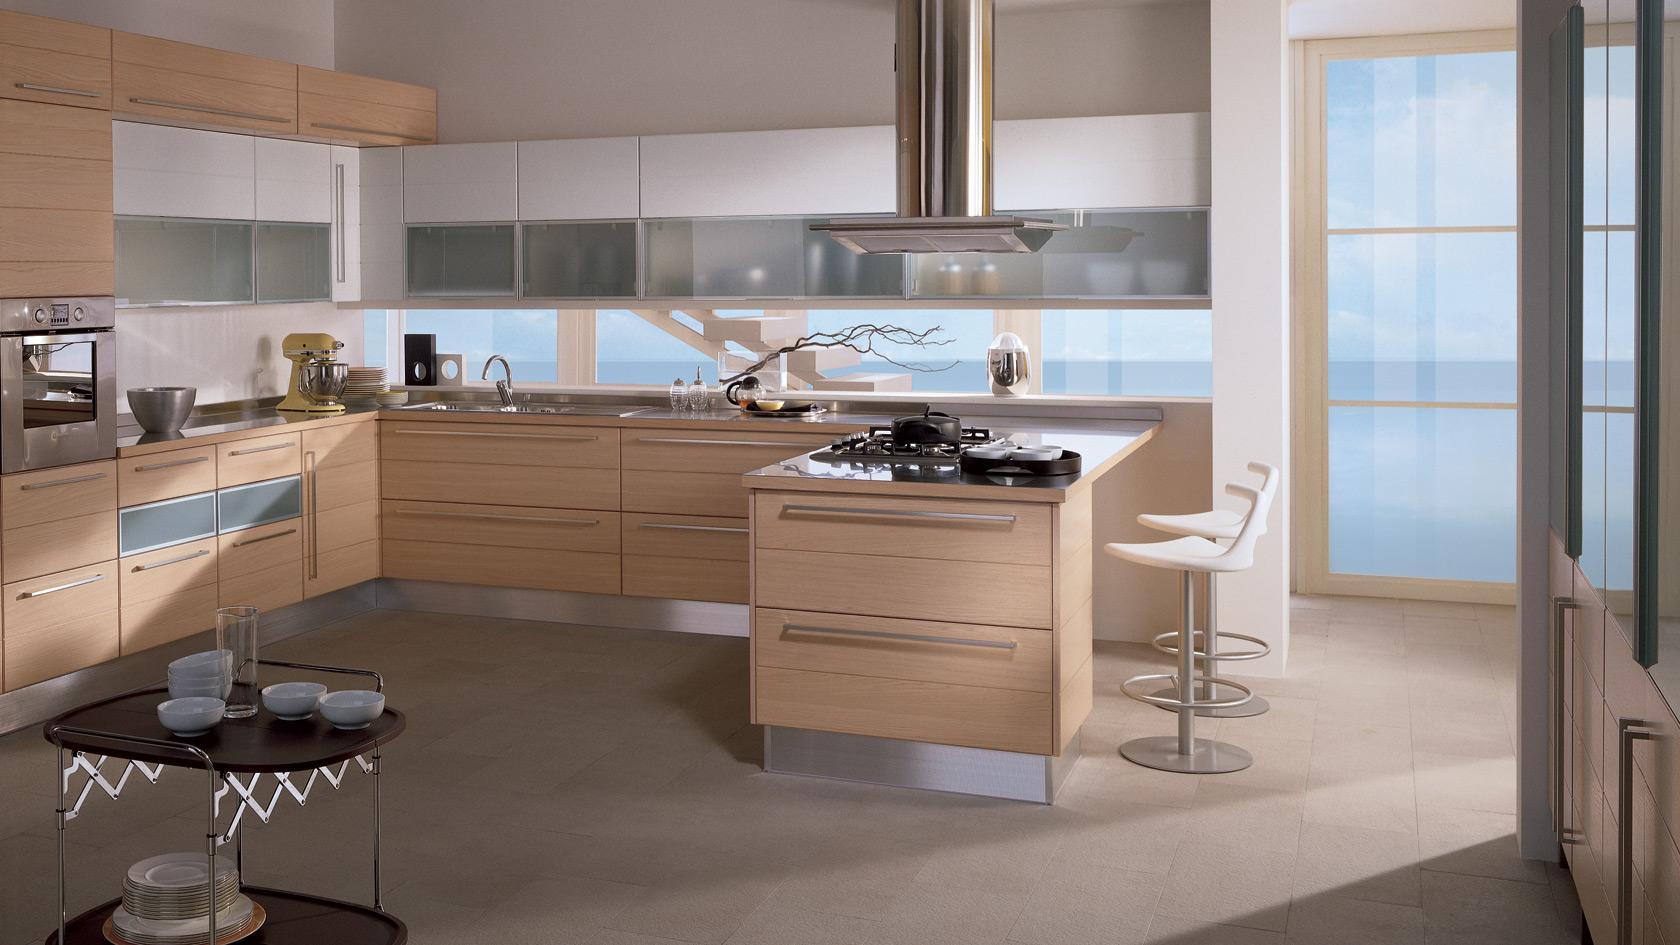 Play kuchy sk linka s barem - Cucine moderne con finestra sul lavello ...